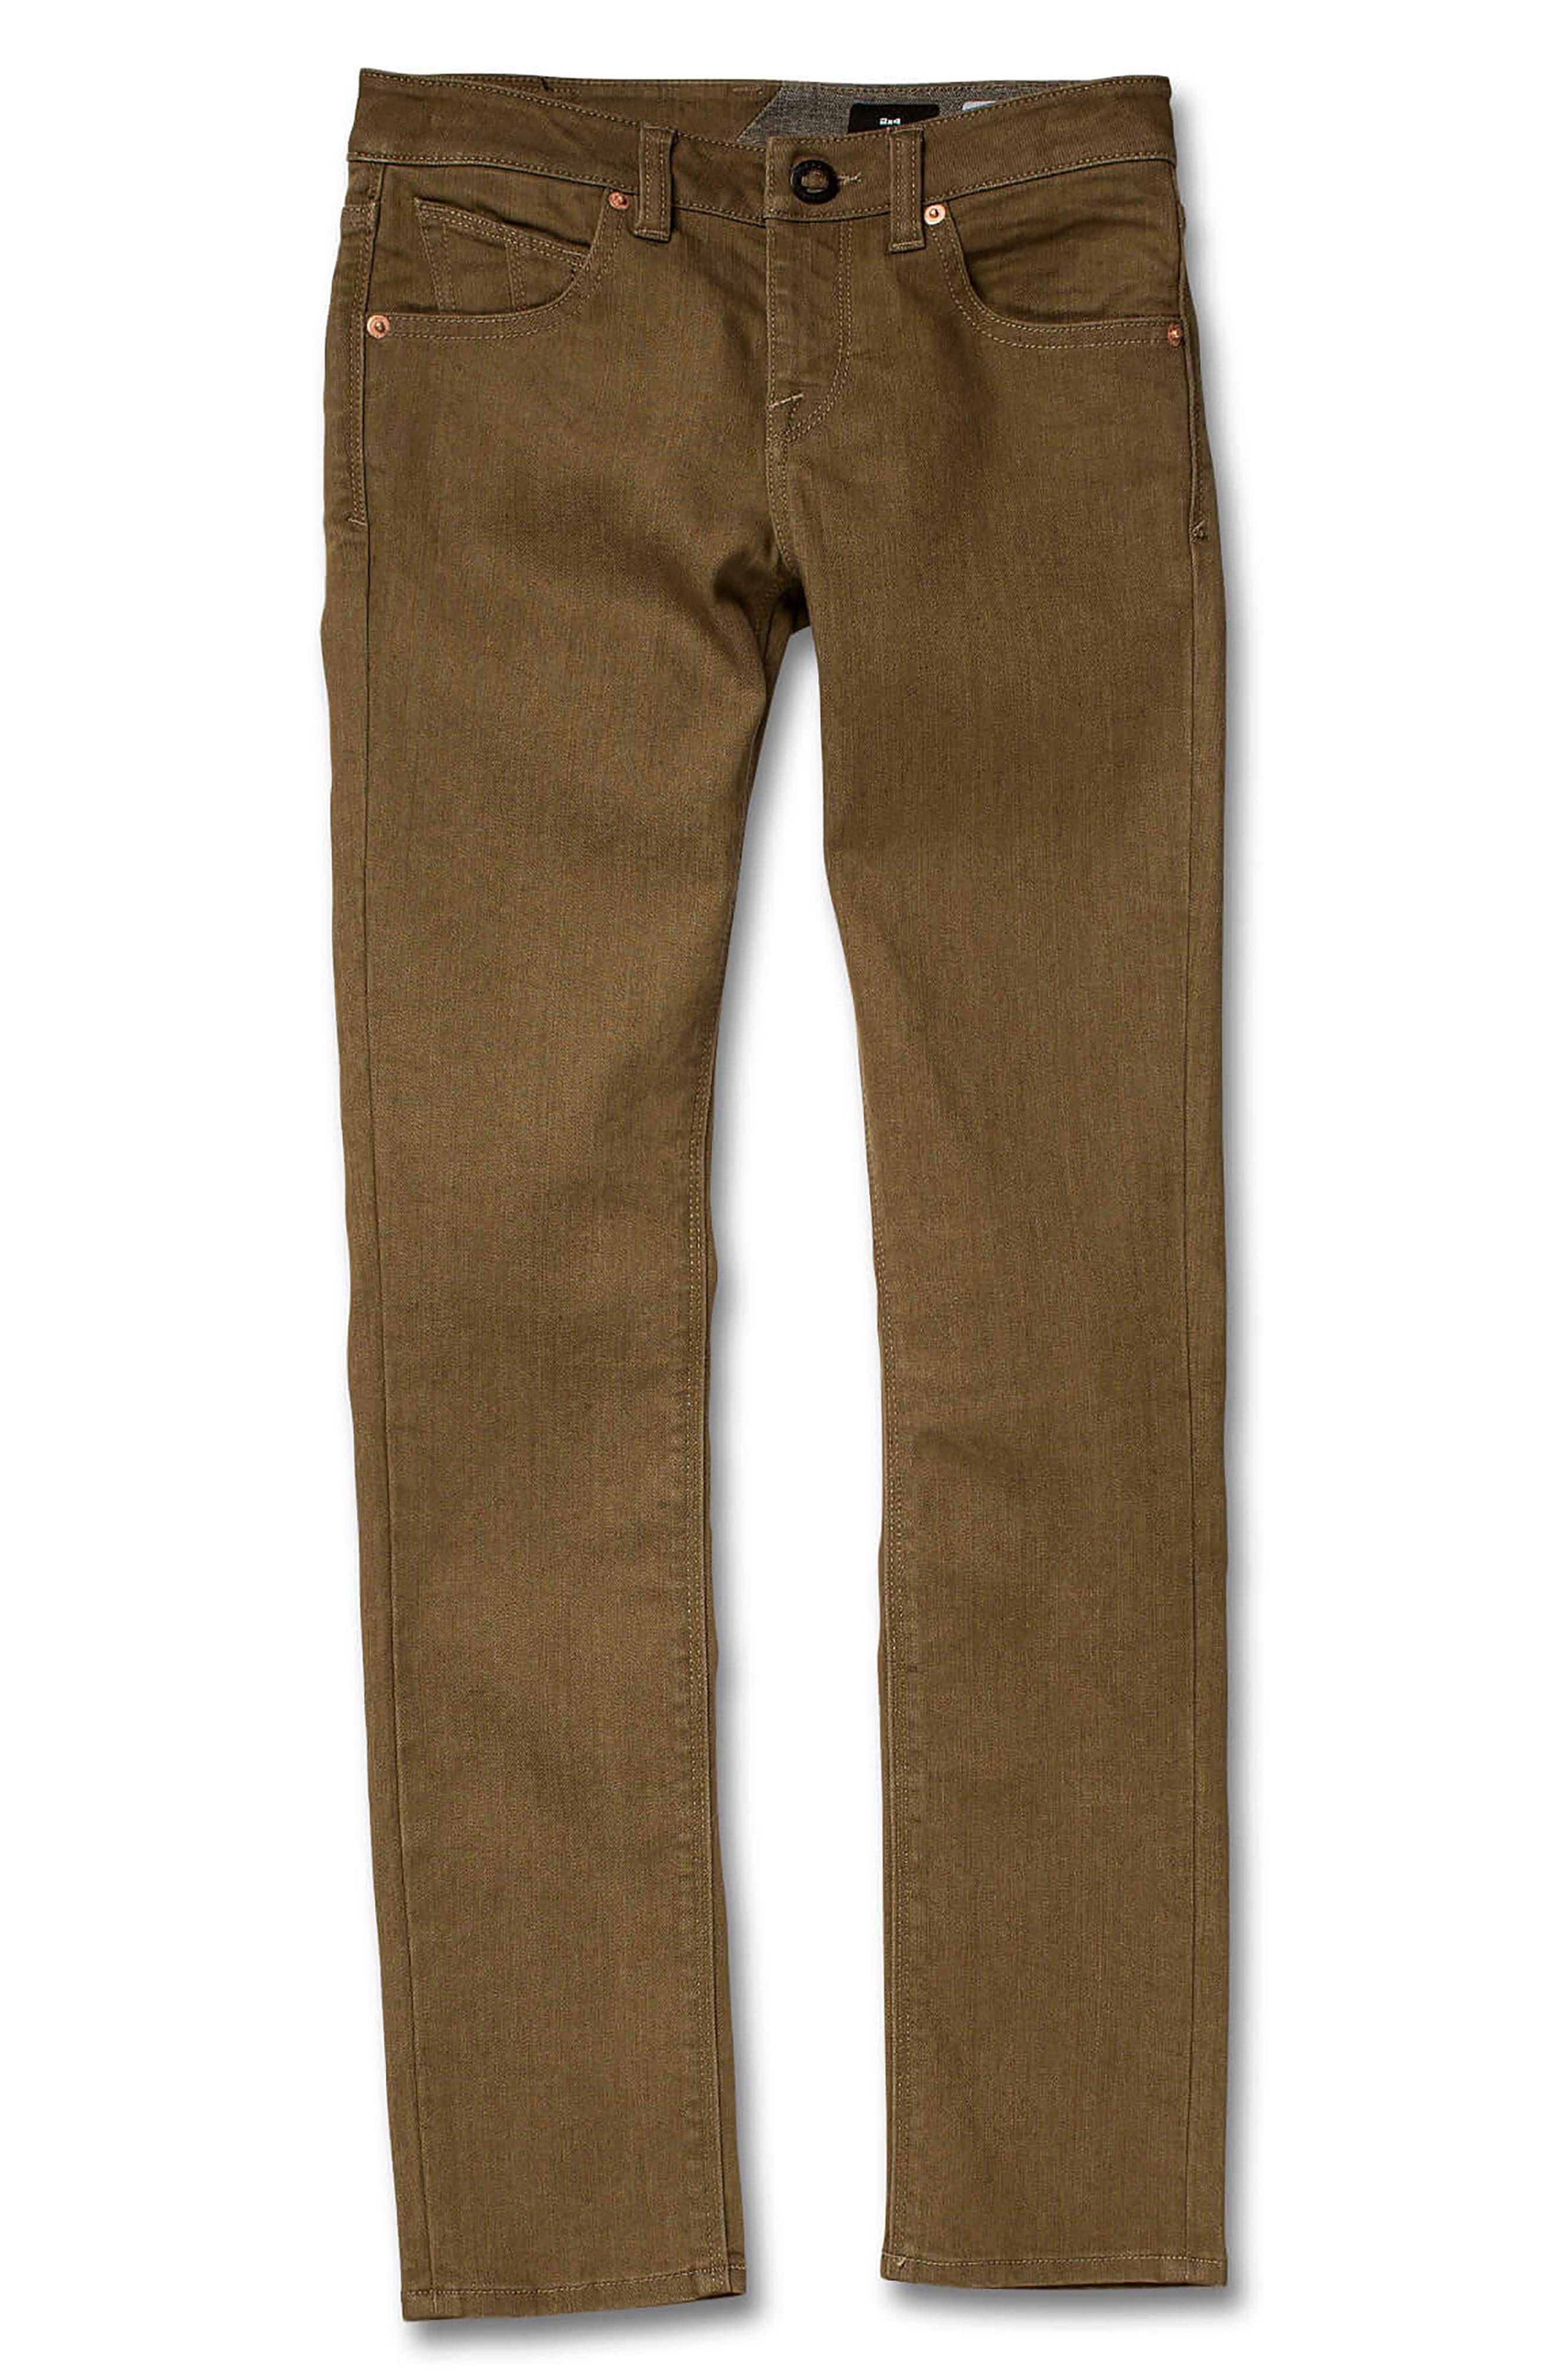 VOLCOM, '2x4' Skinny Jeans, Main thumbnail 1, color, WET SAND